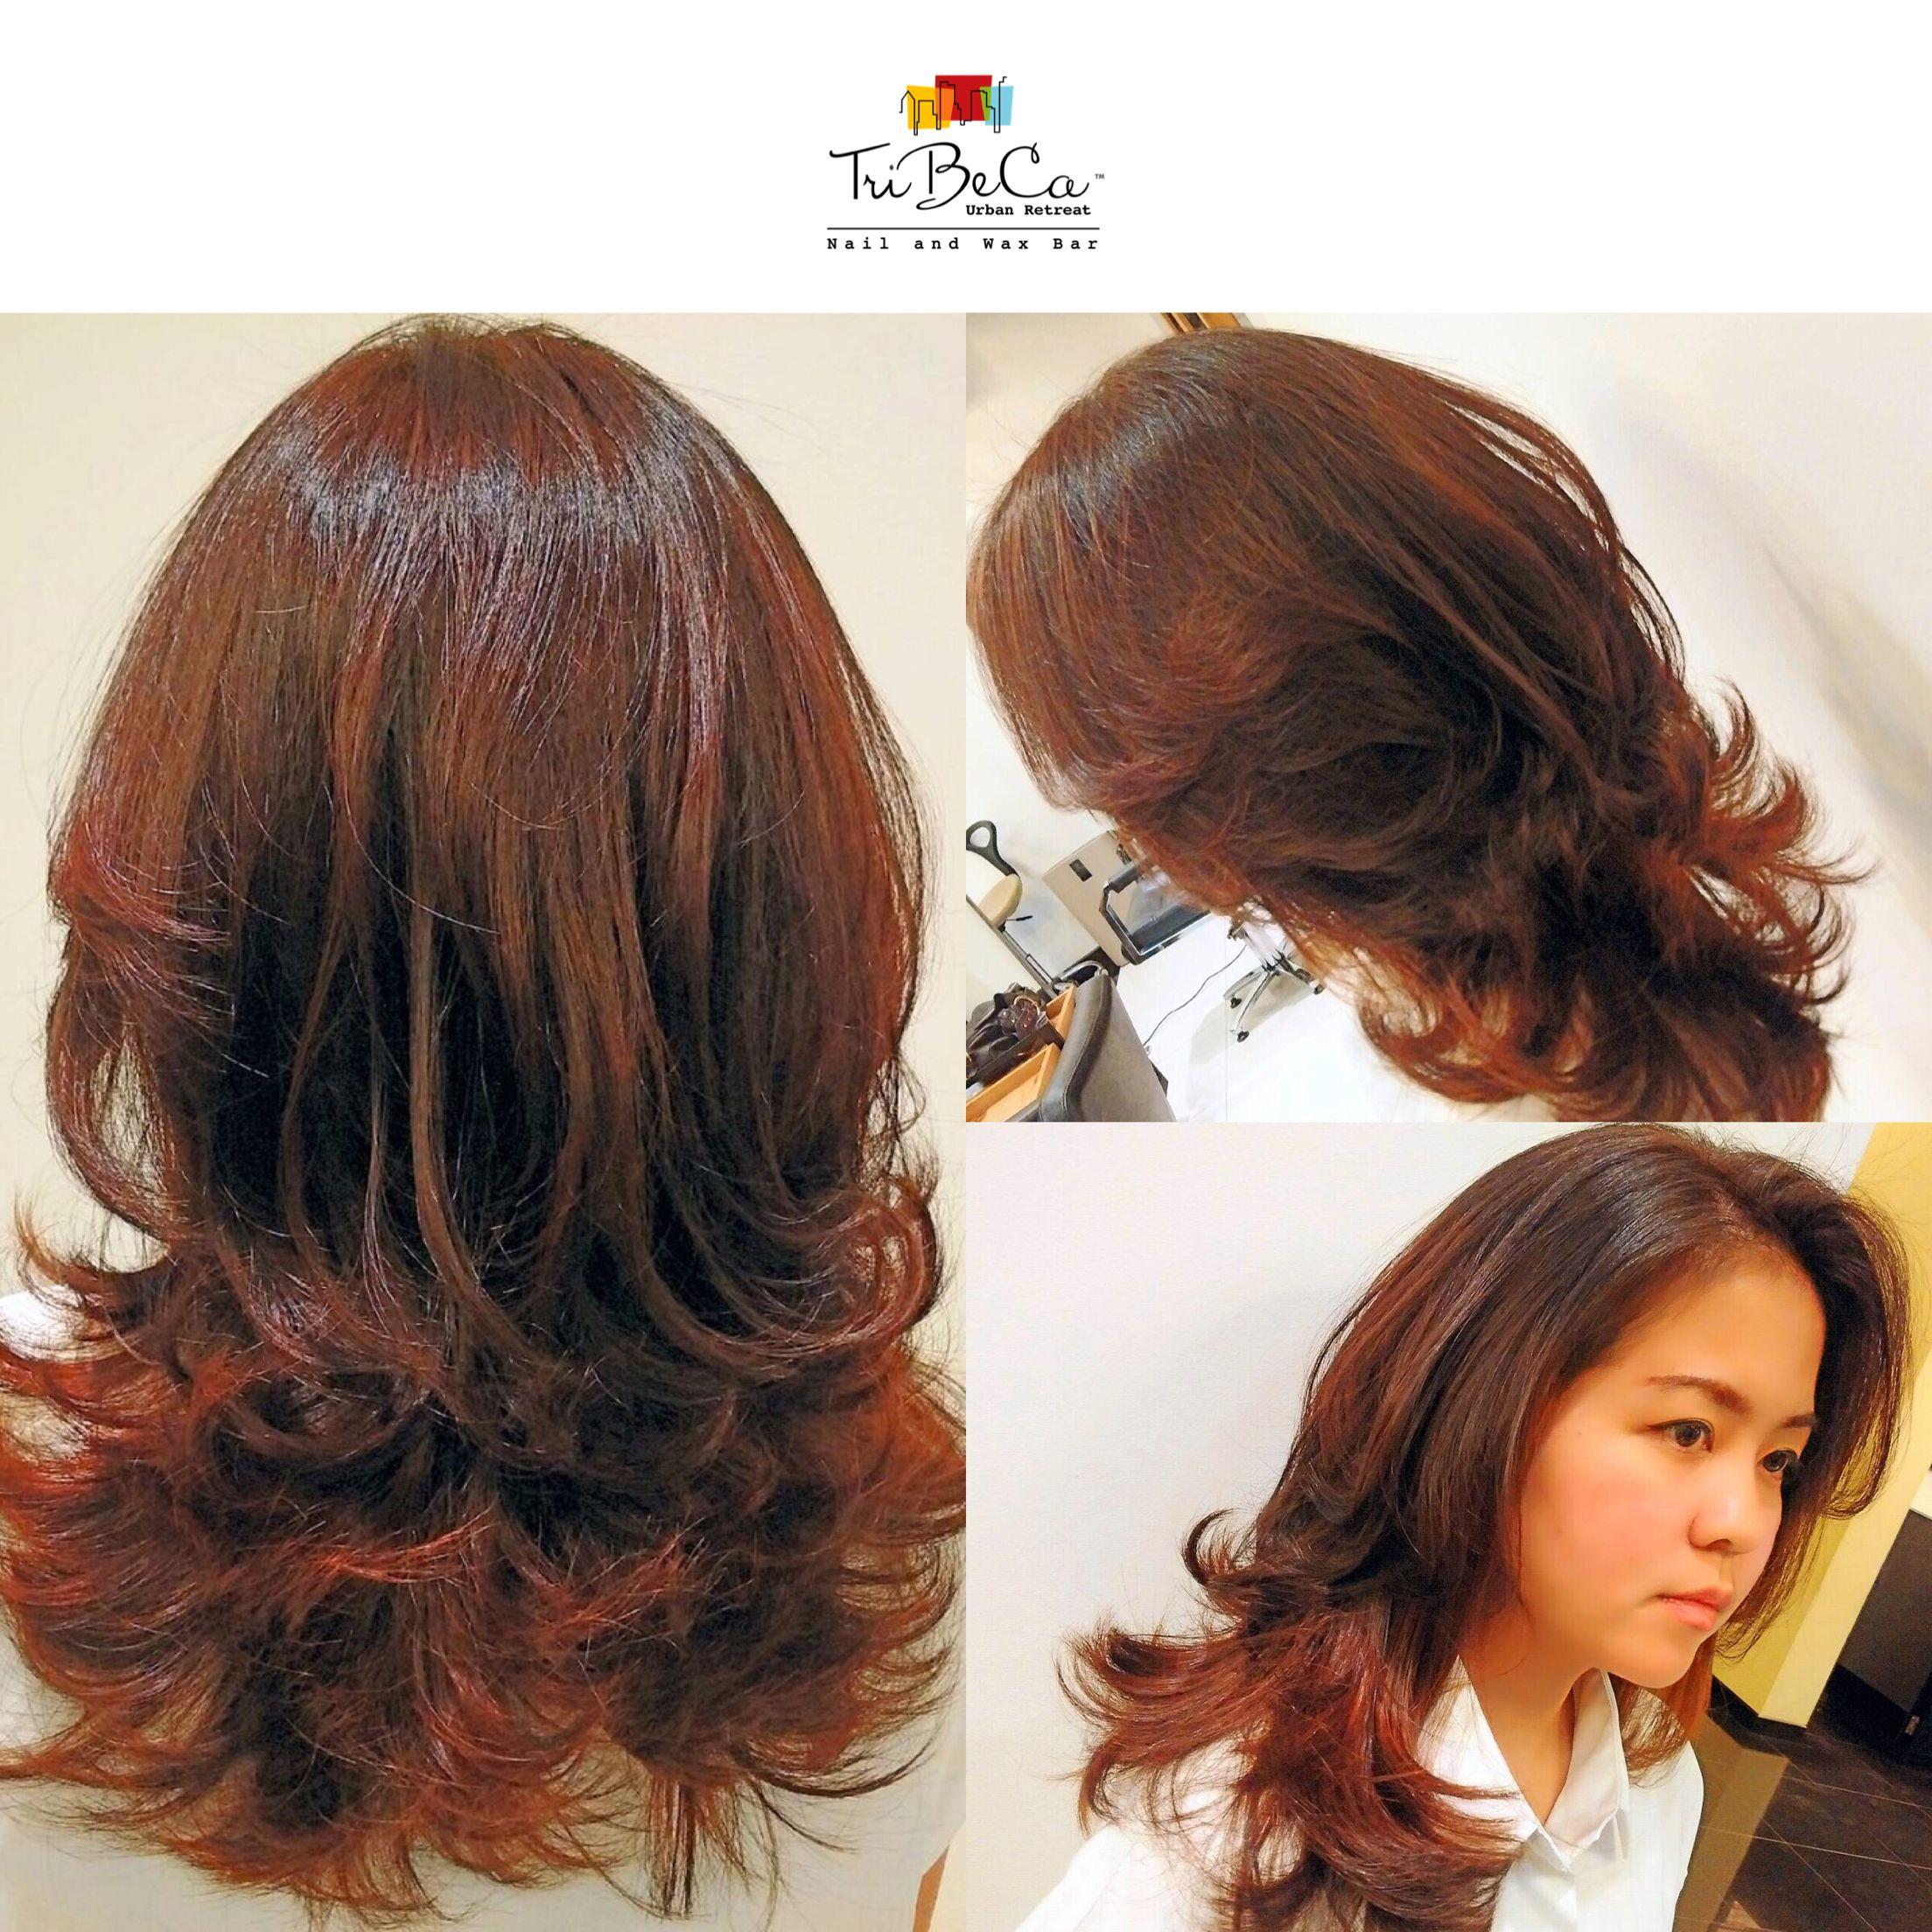 Gradation Hair Color And Haircut For Windy Ilovetribeca Tribecaurbanretreat Haircut Haircolor Salon Bandung